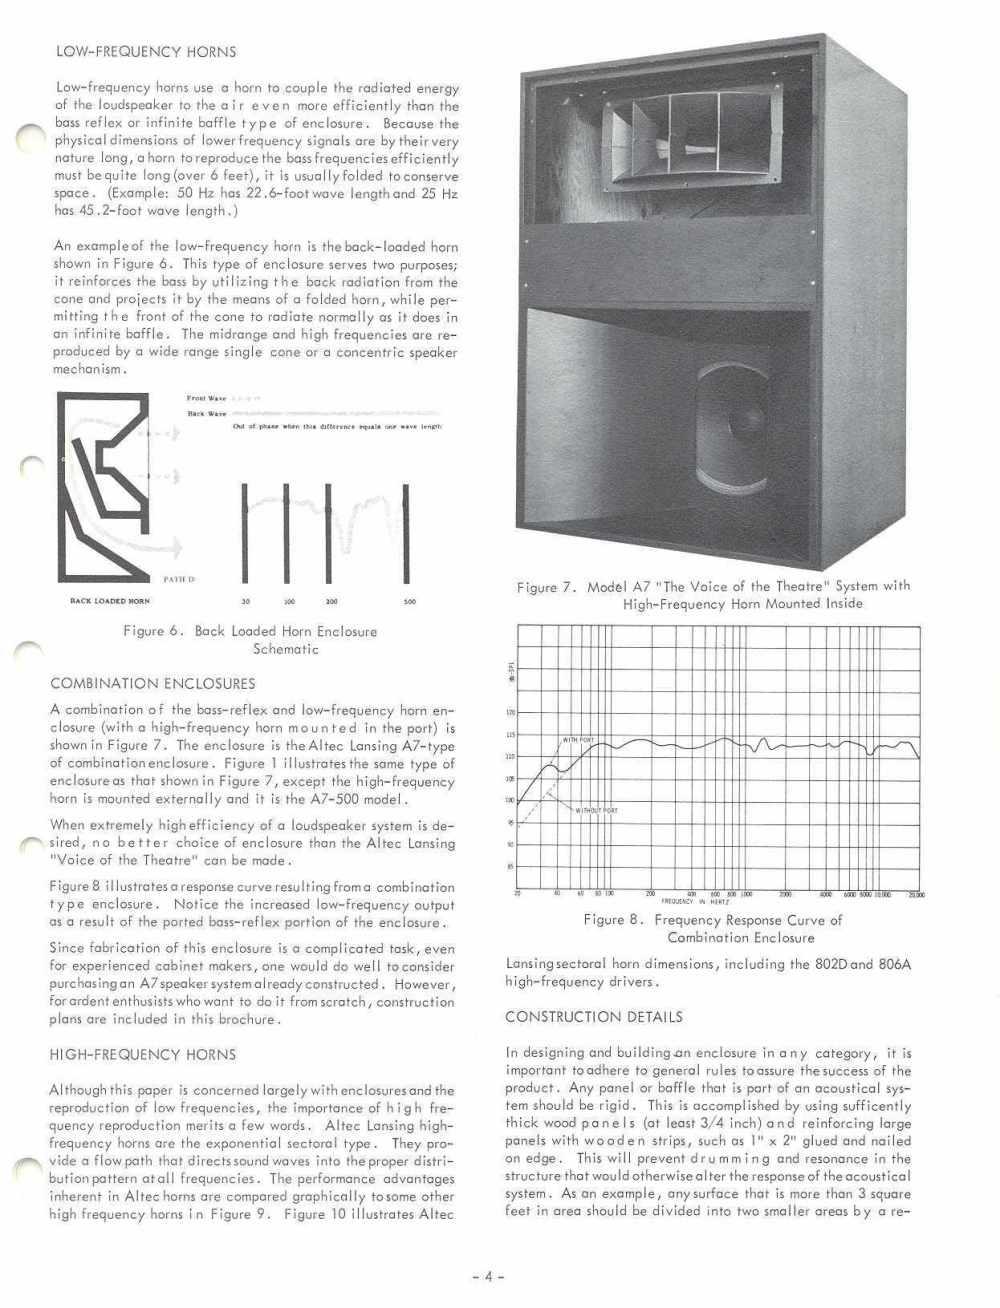 medium resolution of altec 1968 enclosure design guide with plans for a7 valencia and maluibu courtesy paul barello altec lansing technologies